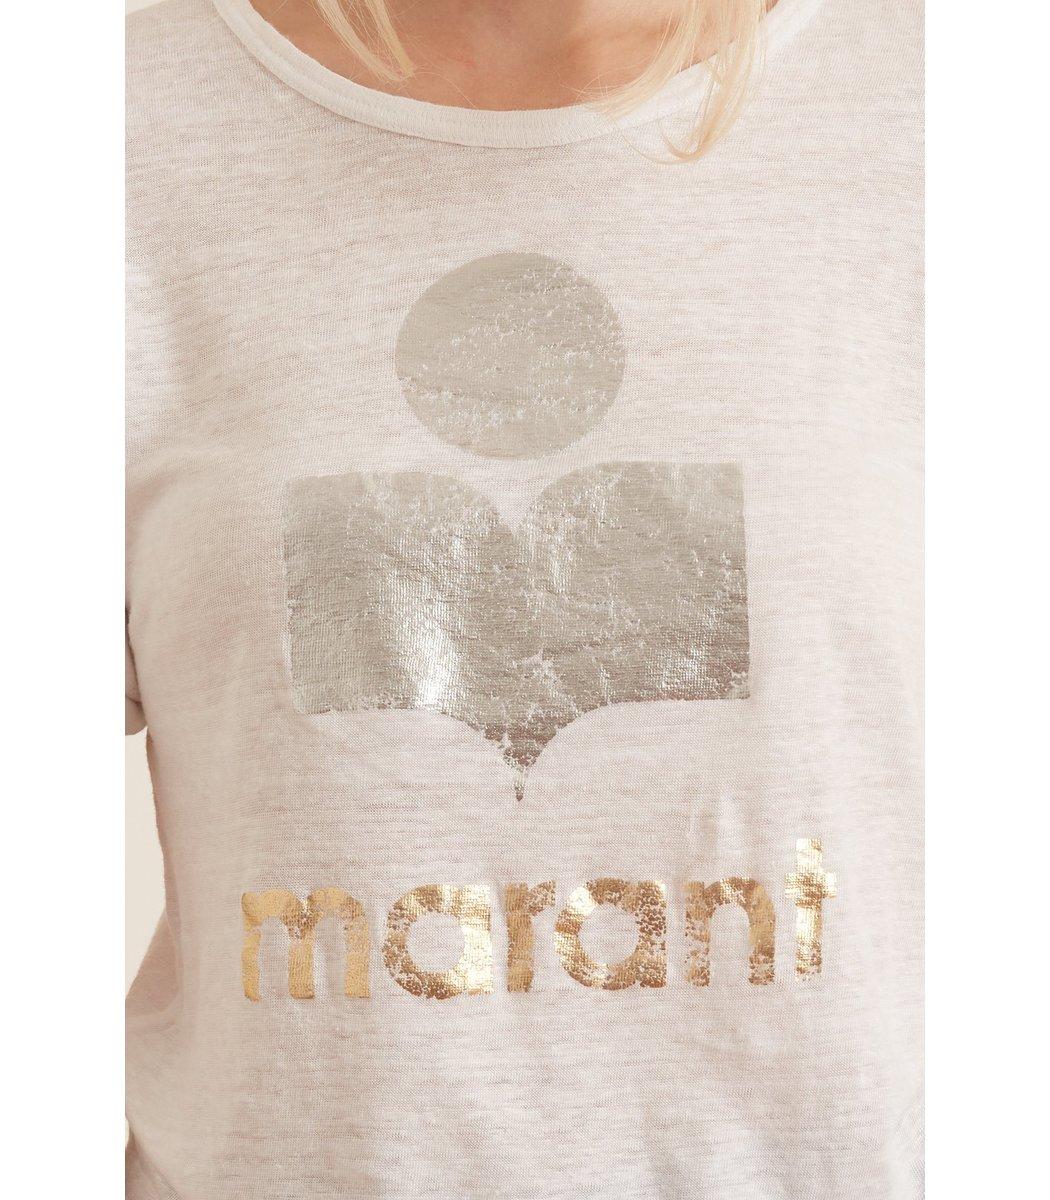 ISABEL MARANT ÉTOILE Denims Koldi Shiny Tee Shirt in White